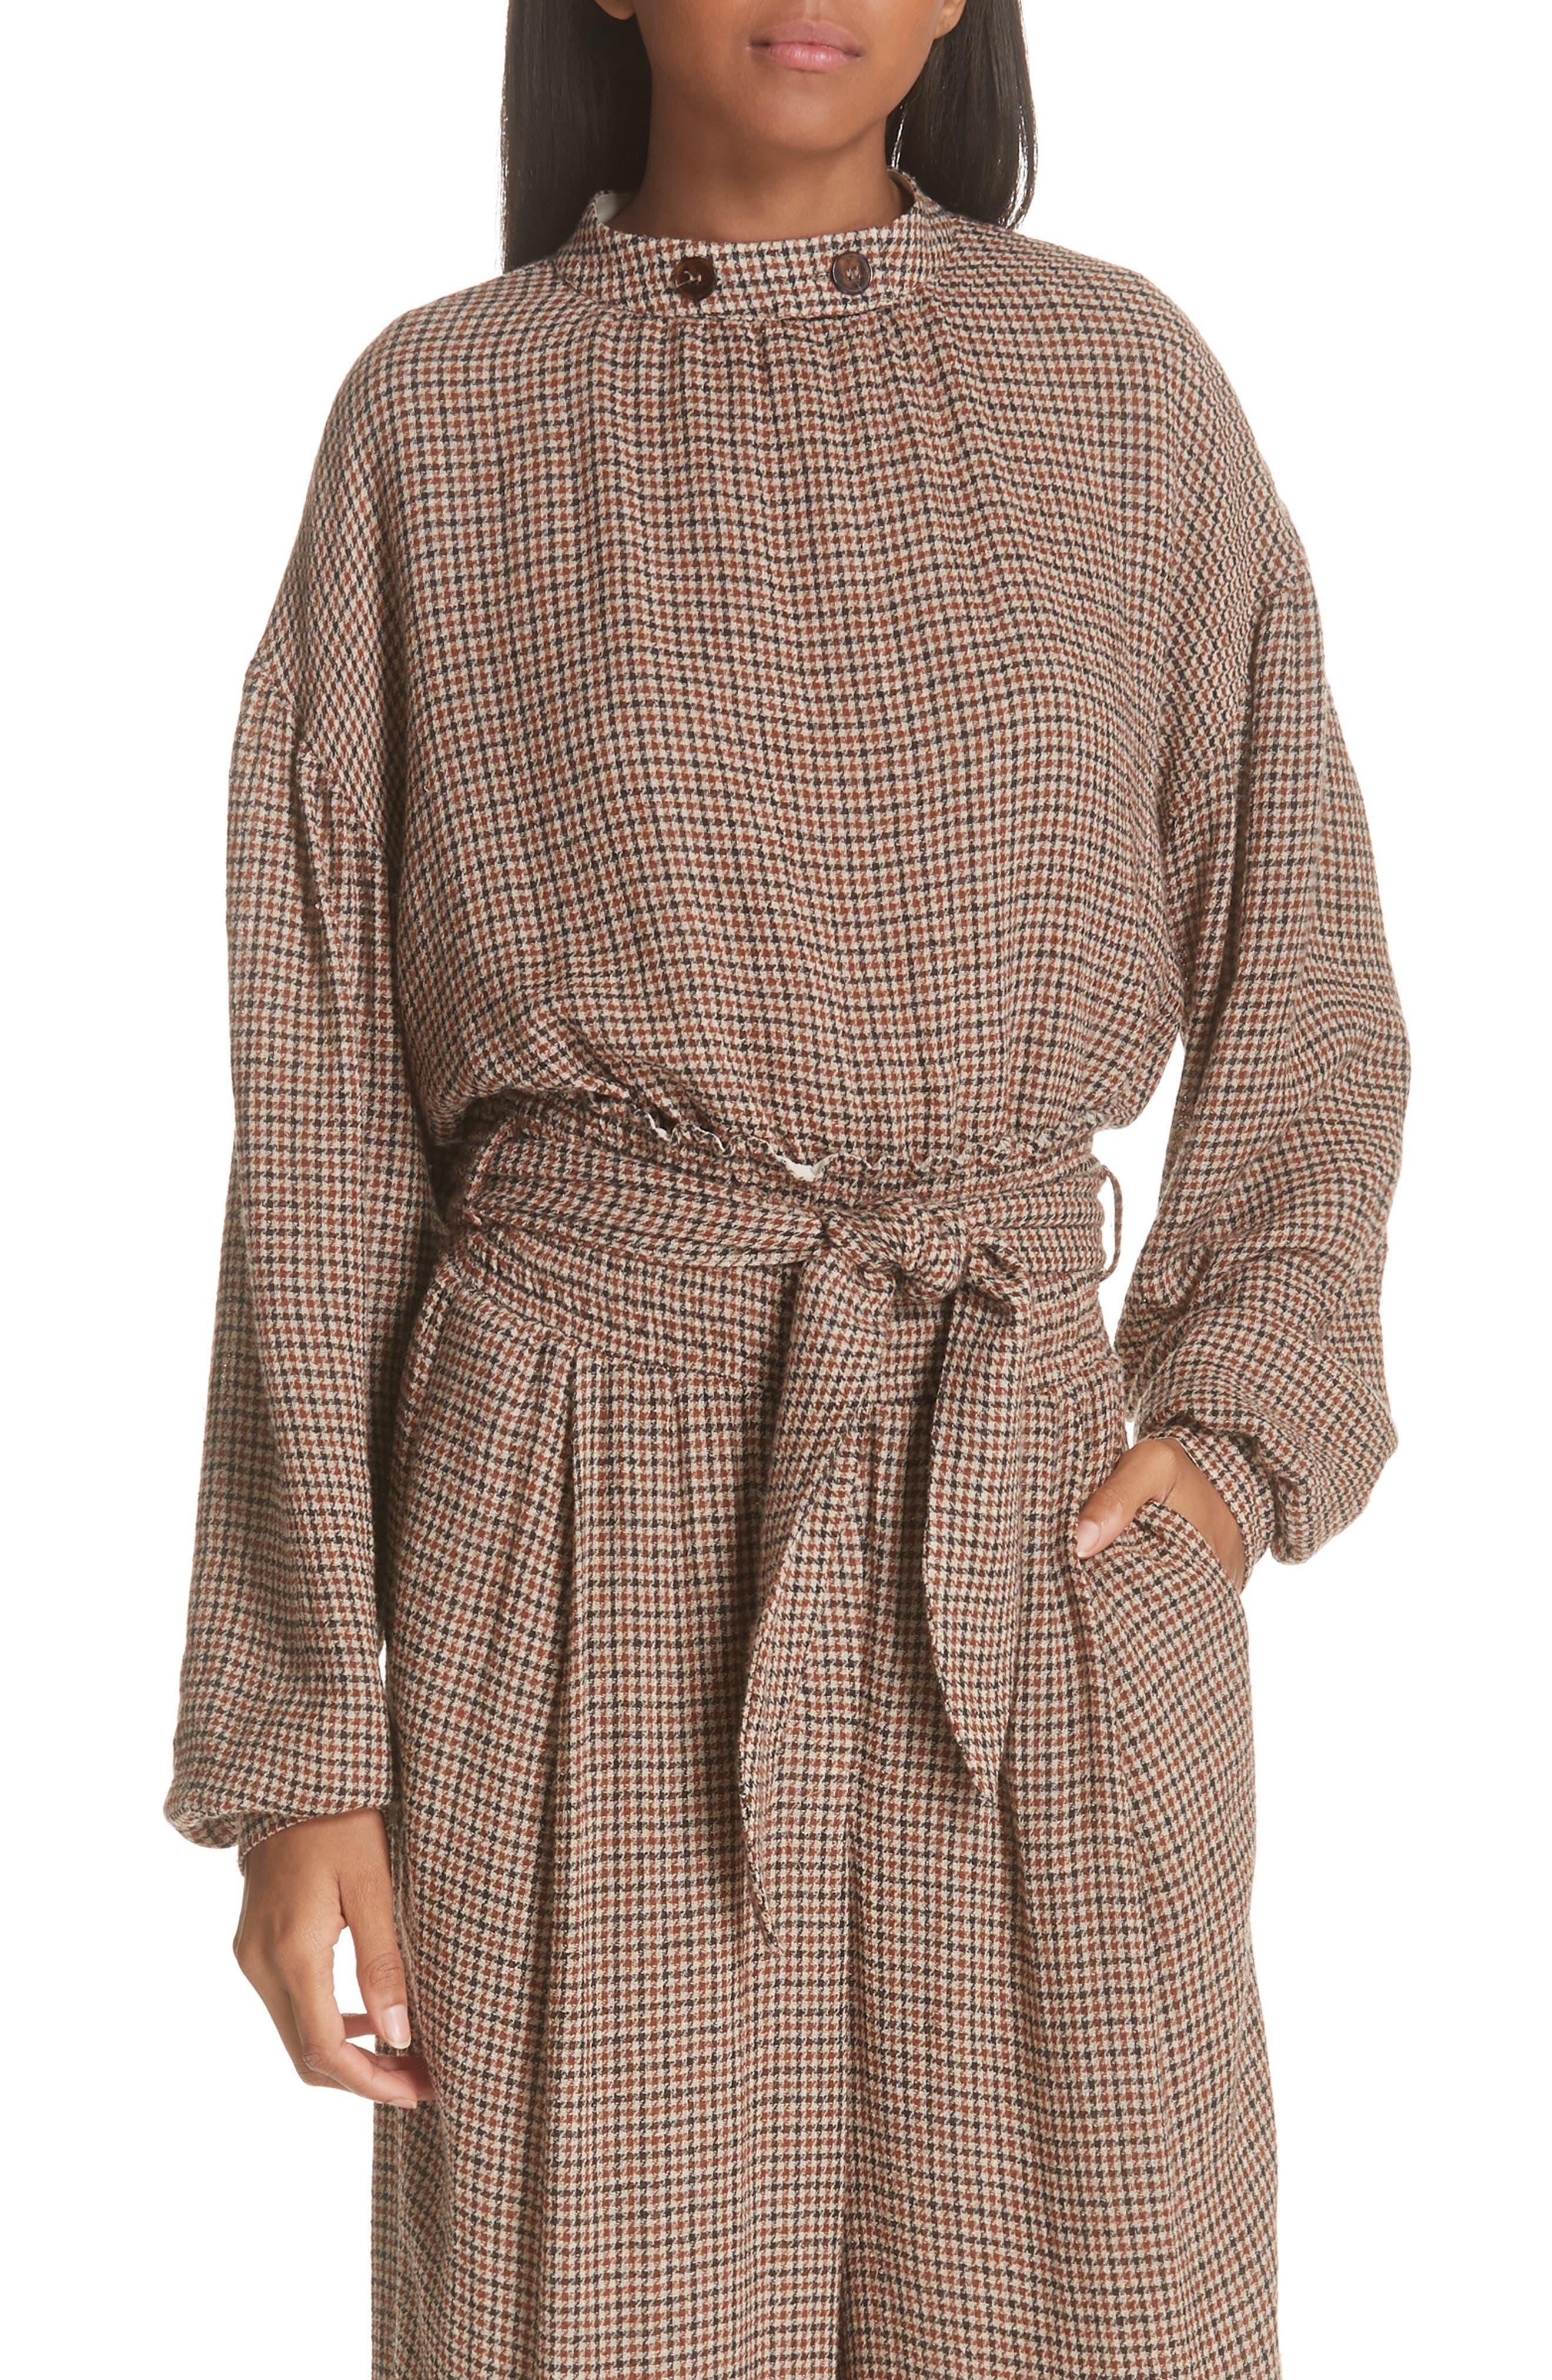 Amara Puff Sleeve Blouse,                         Main,                         color, CHECK